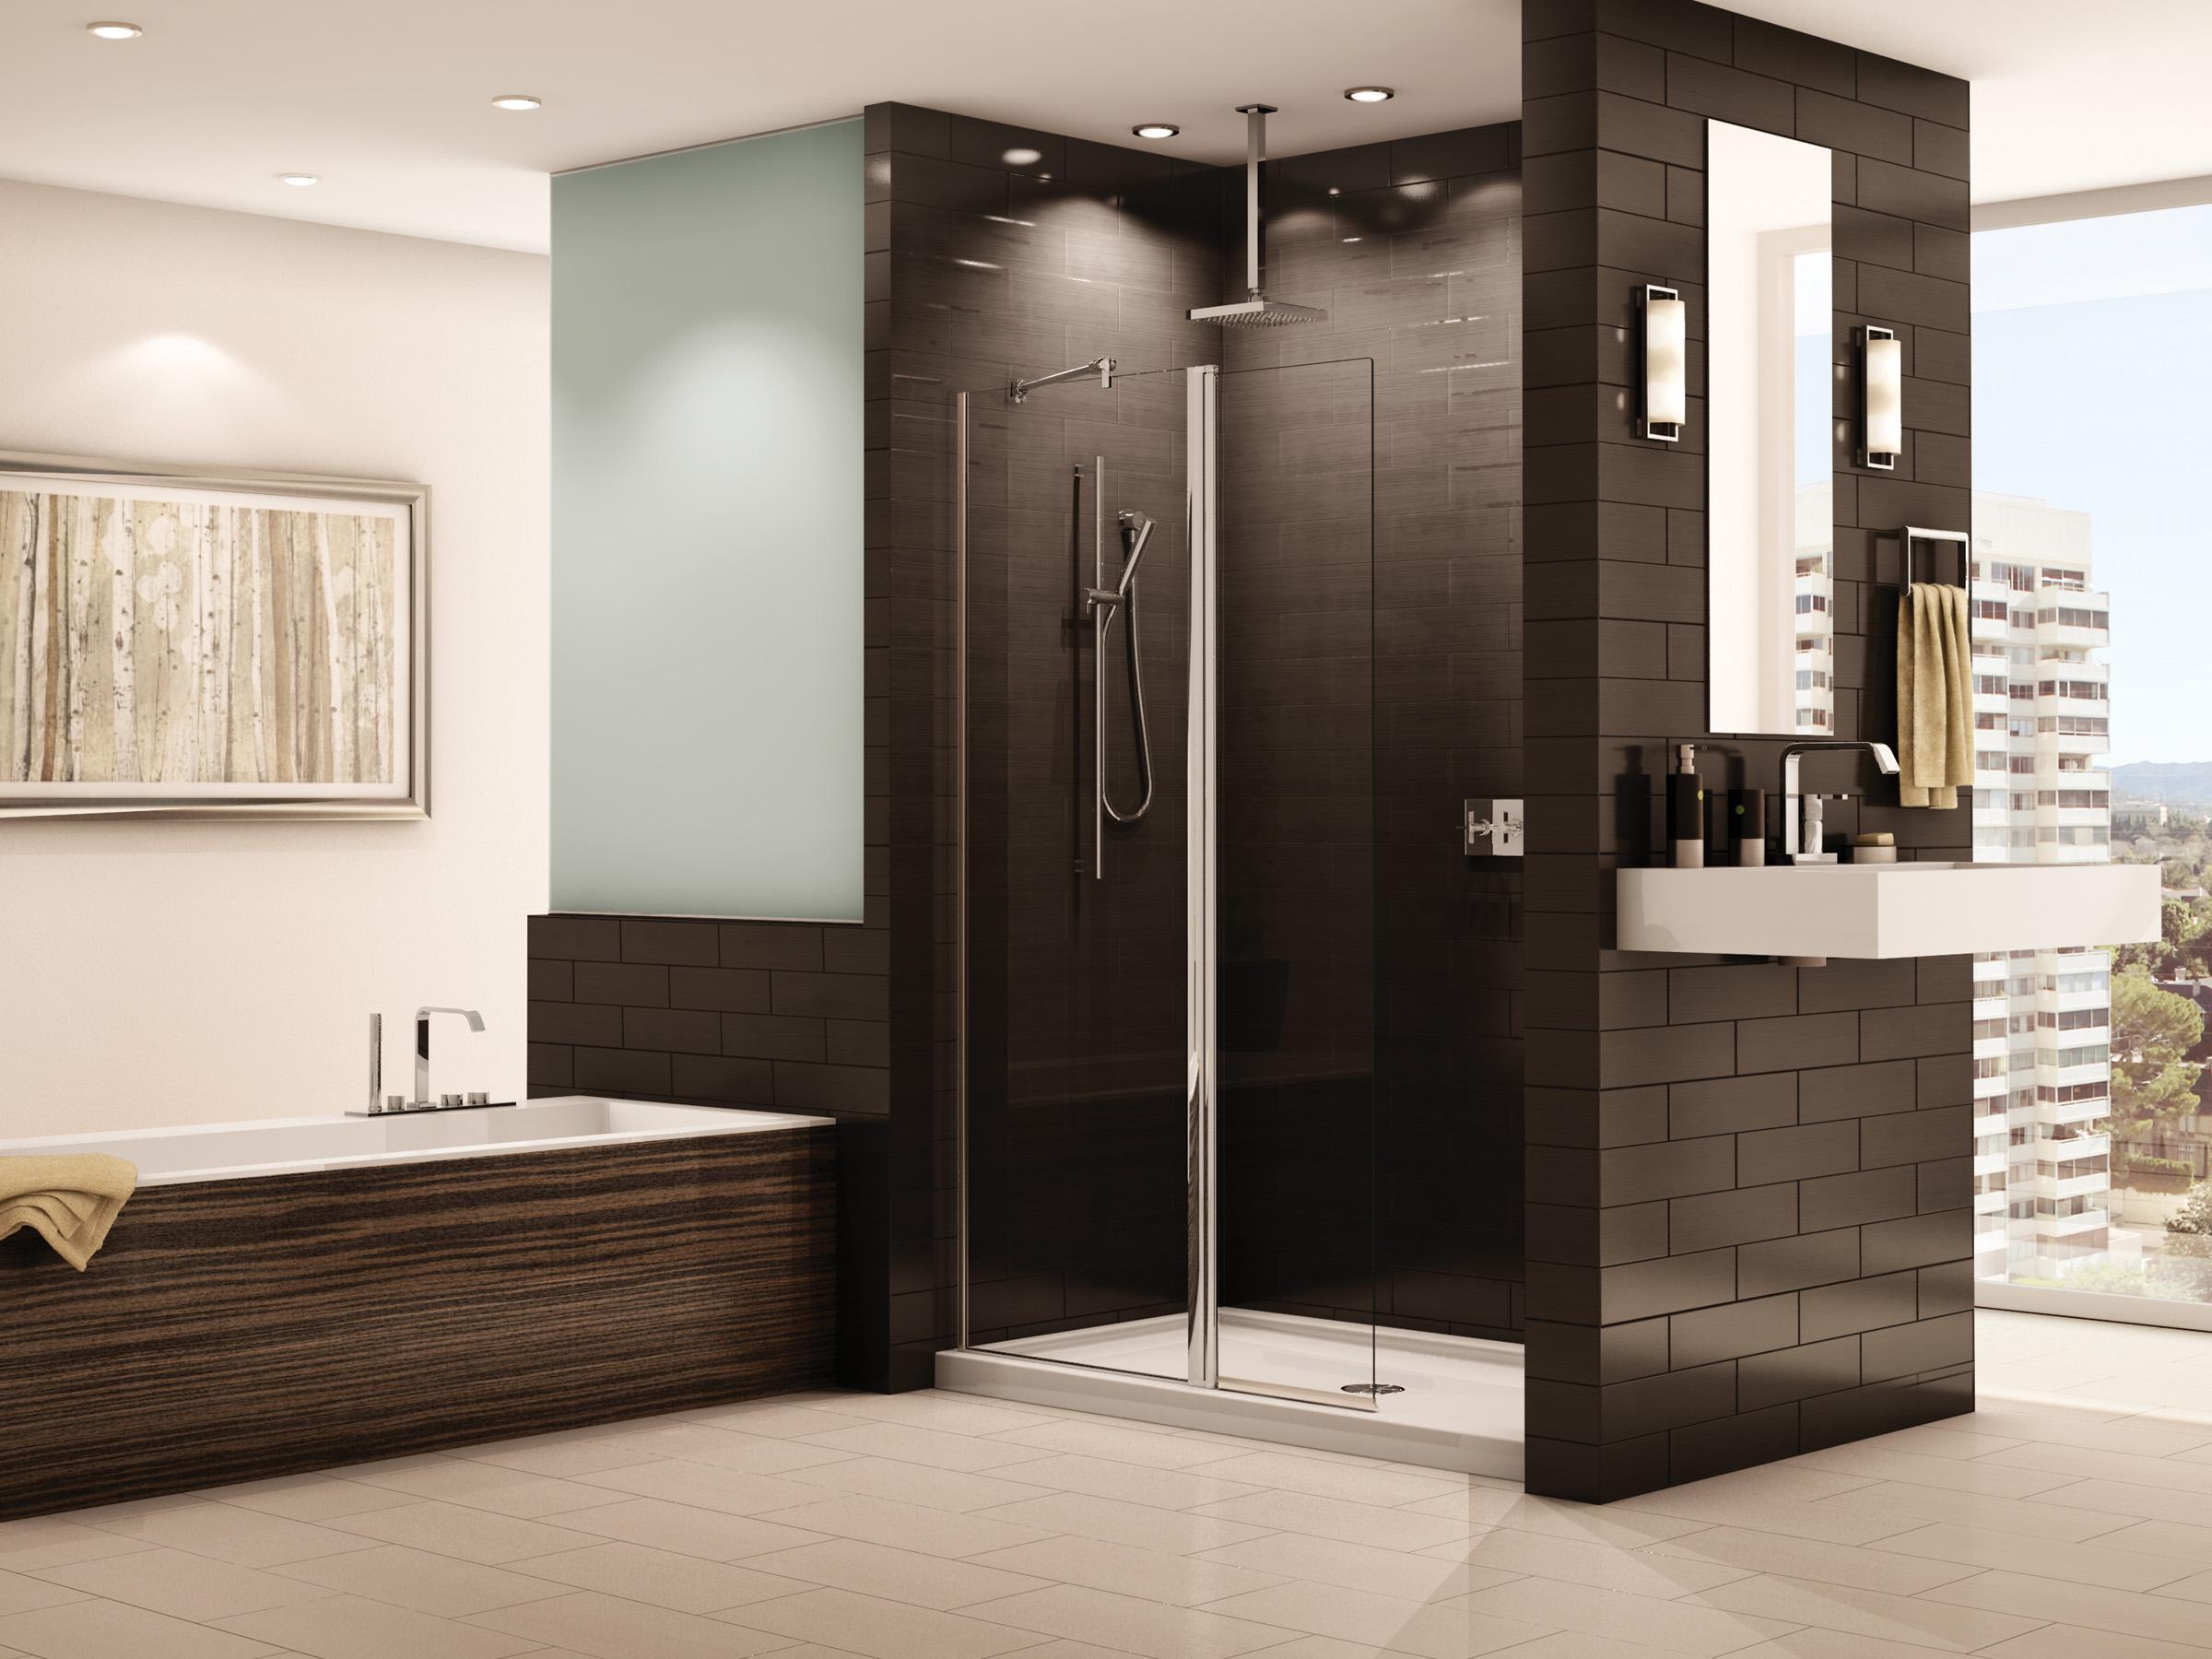 KBIS 2013 spotlight: Fleurco shower enclosure and bath tubs